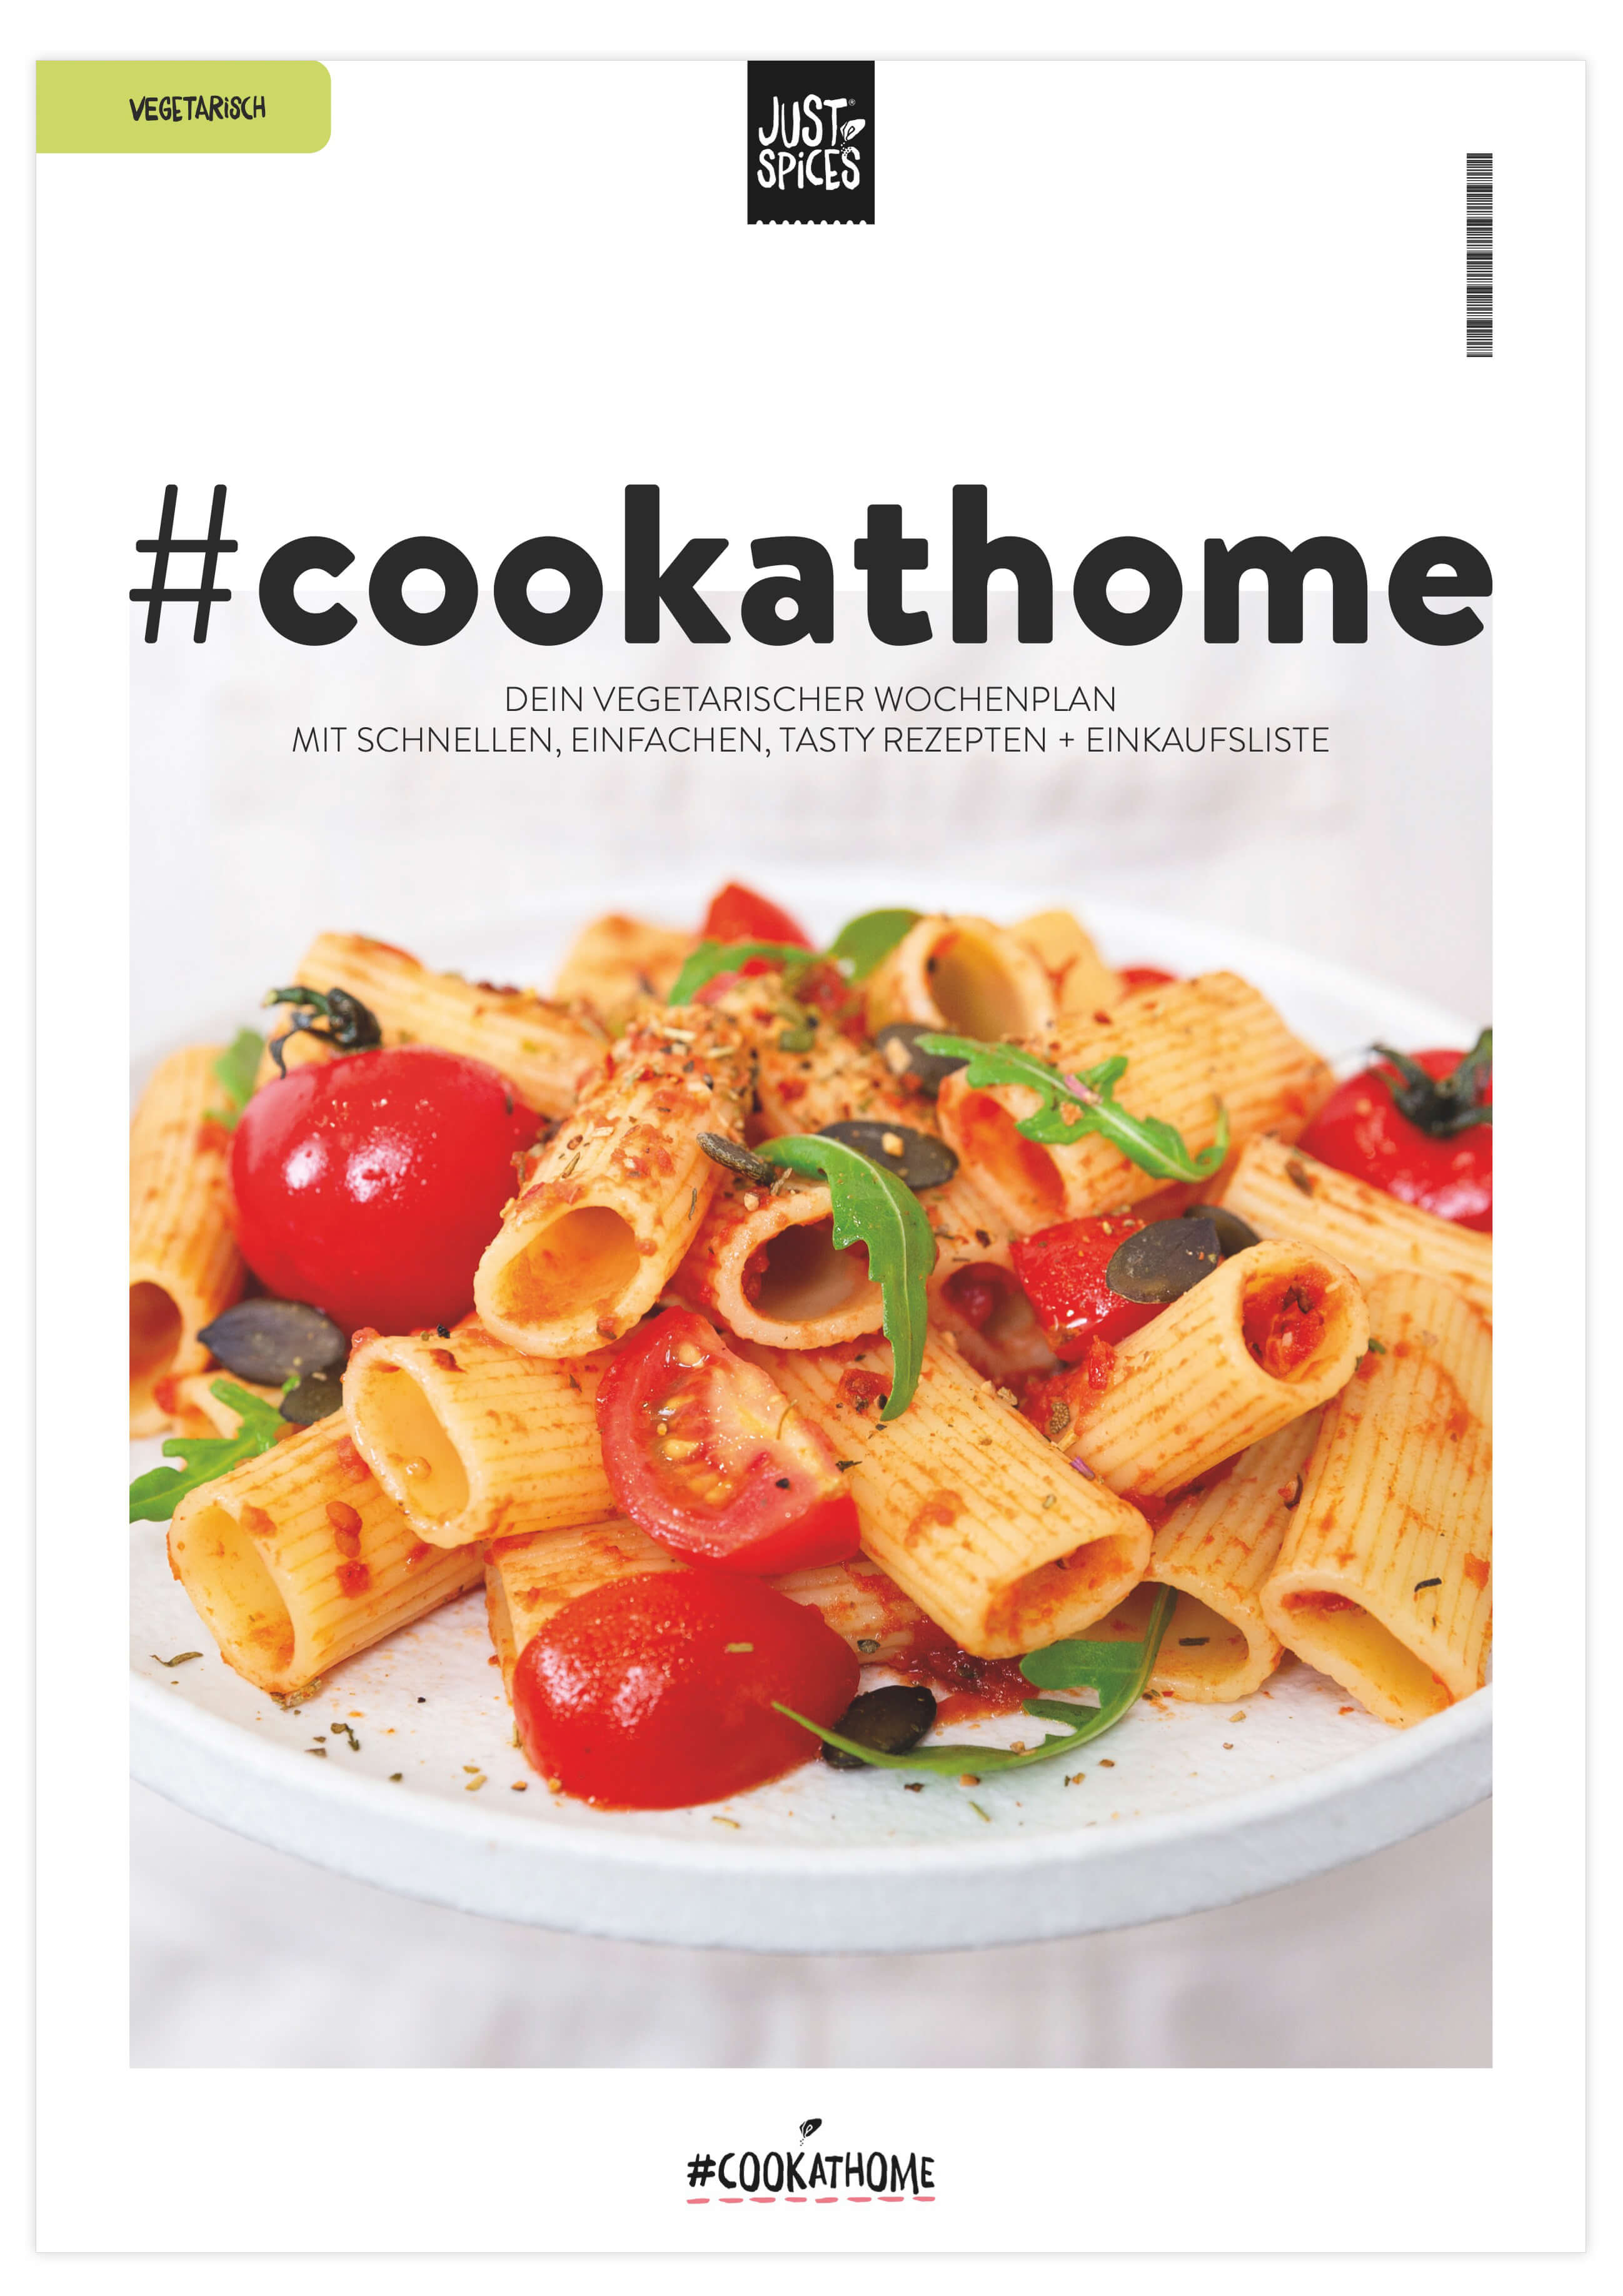 Cookathome Veggie Guide